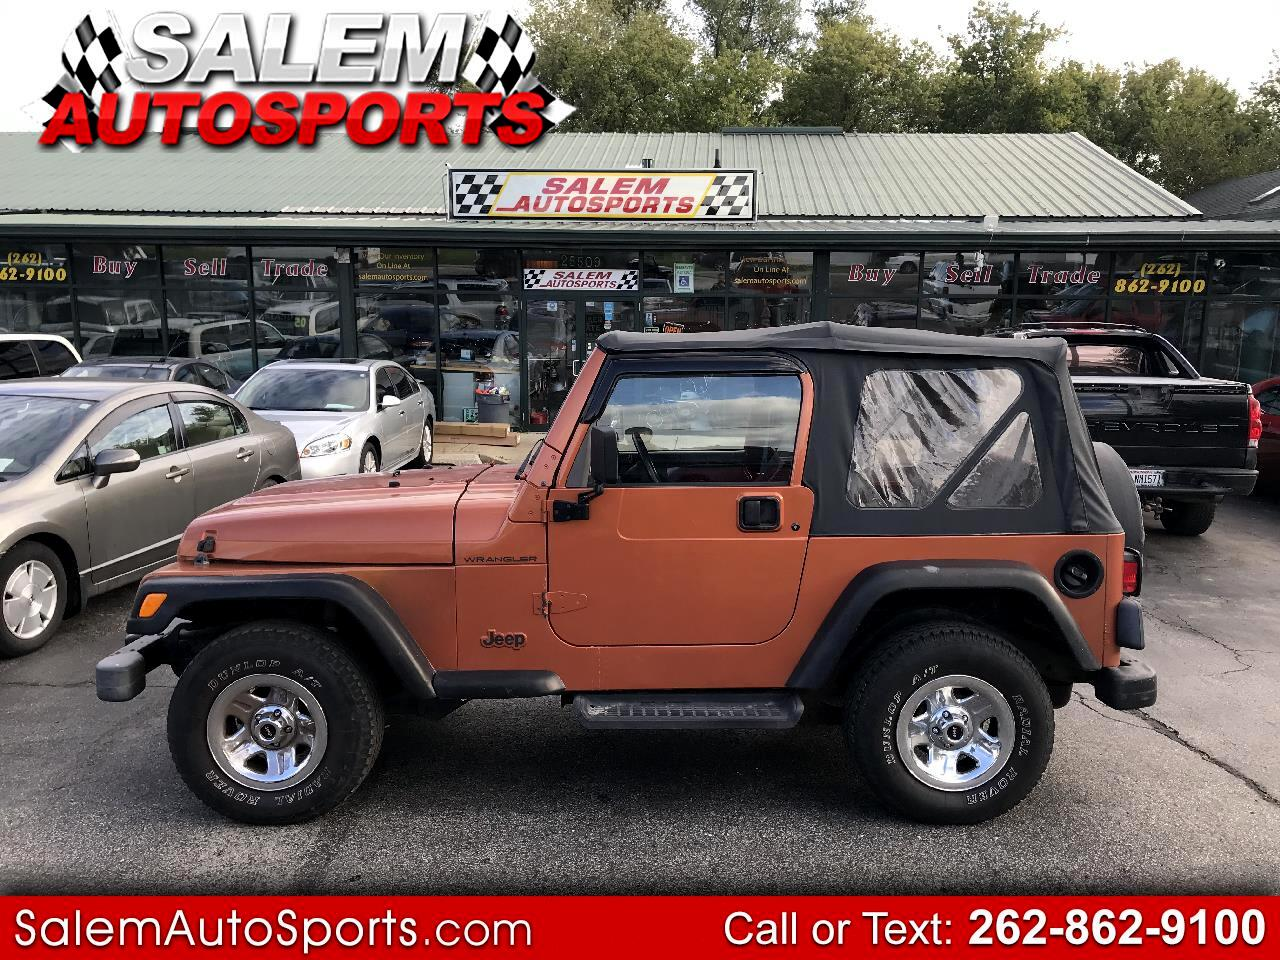 Jeep Wrangler 2dr SE 2001